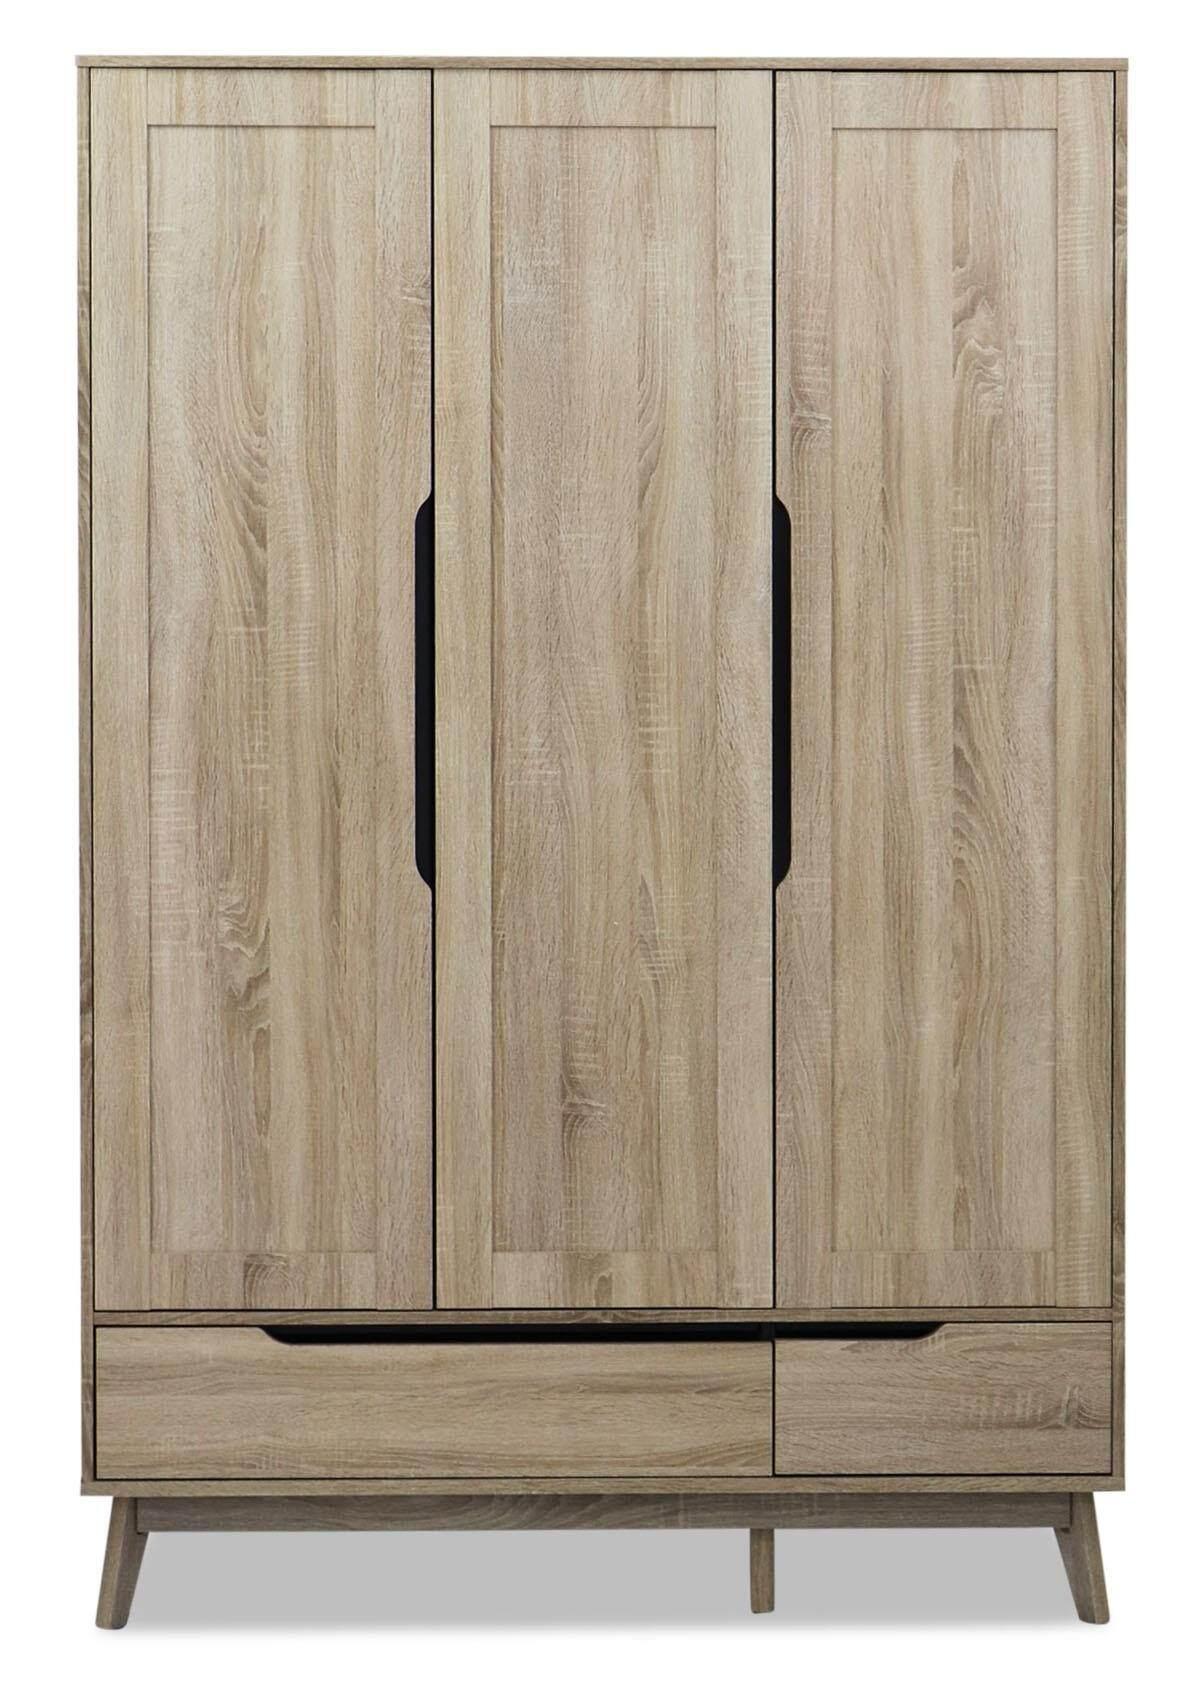 Fella 3 Door Wardrobe / Cloth Storage Cabinet / Swing Door Cabinet / Almari Kayu / Almari Baju L1330MM X W600MM X H2000MM